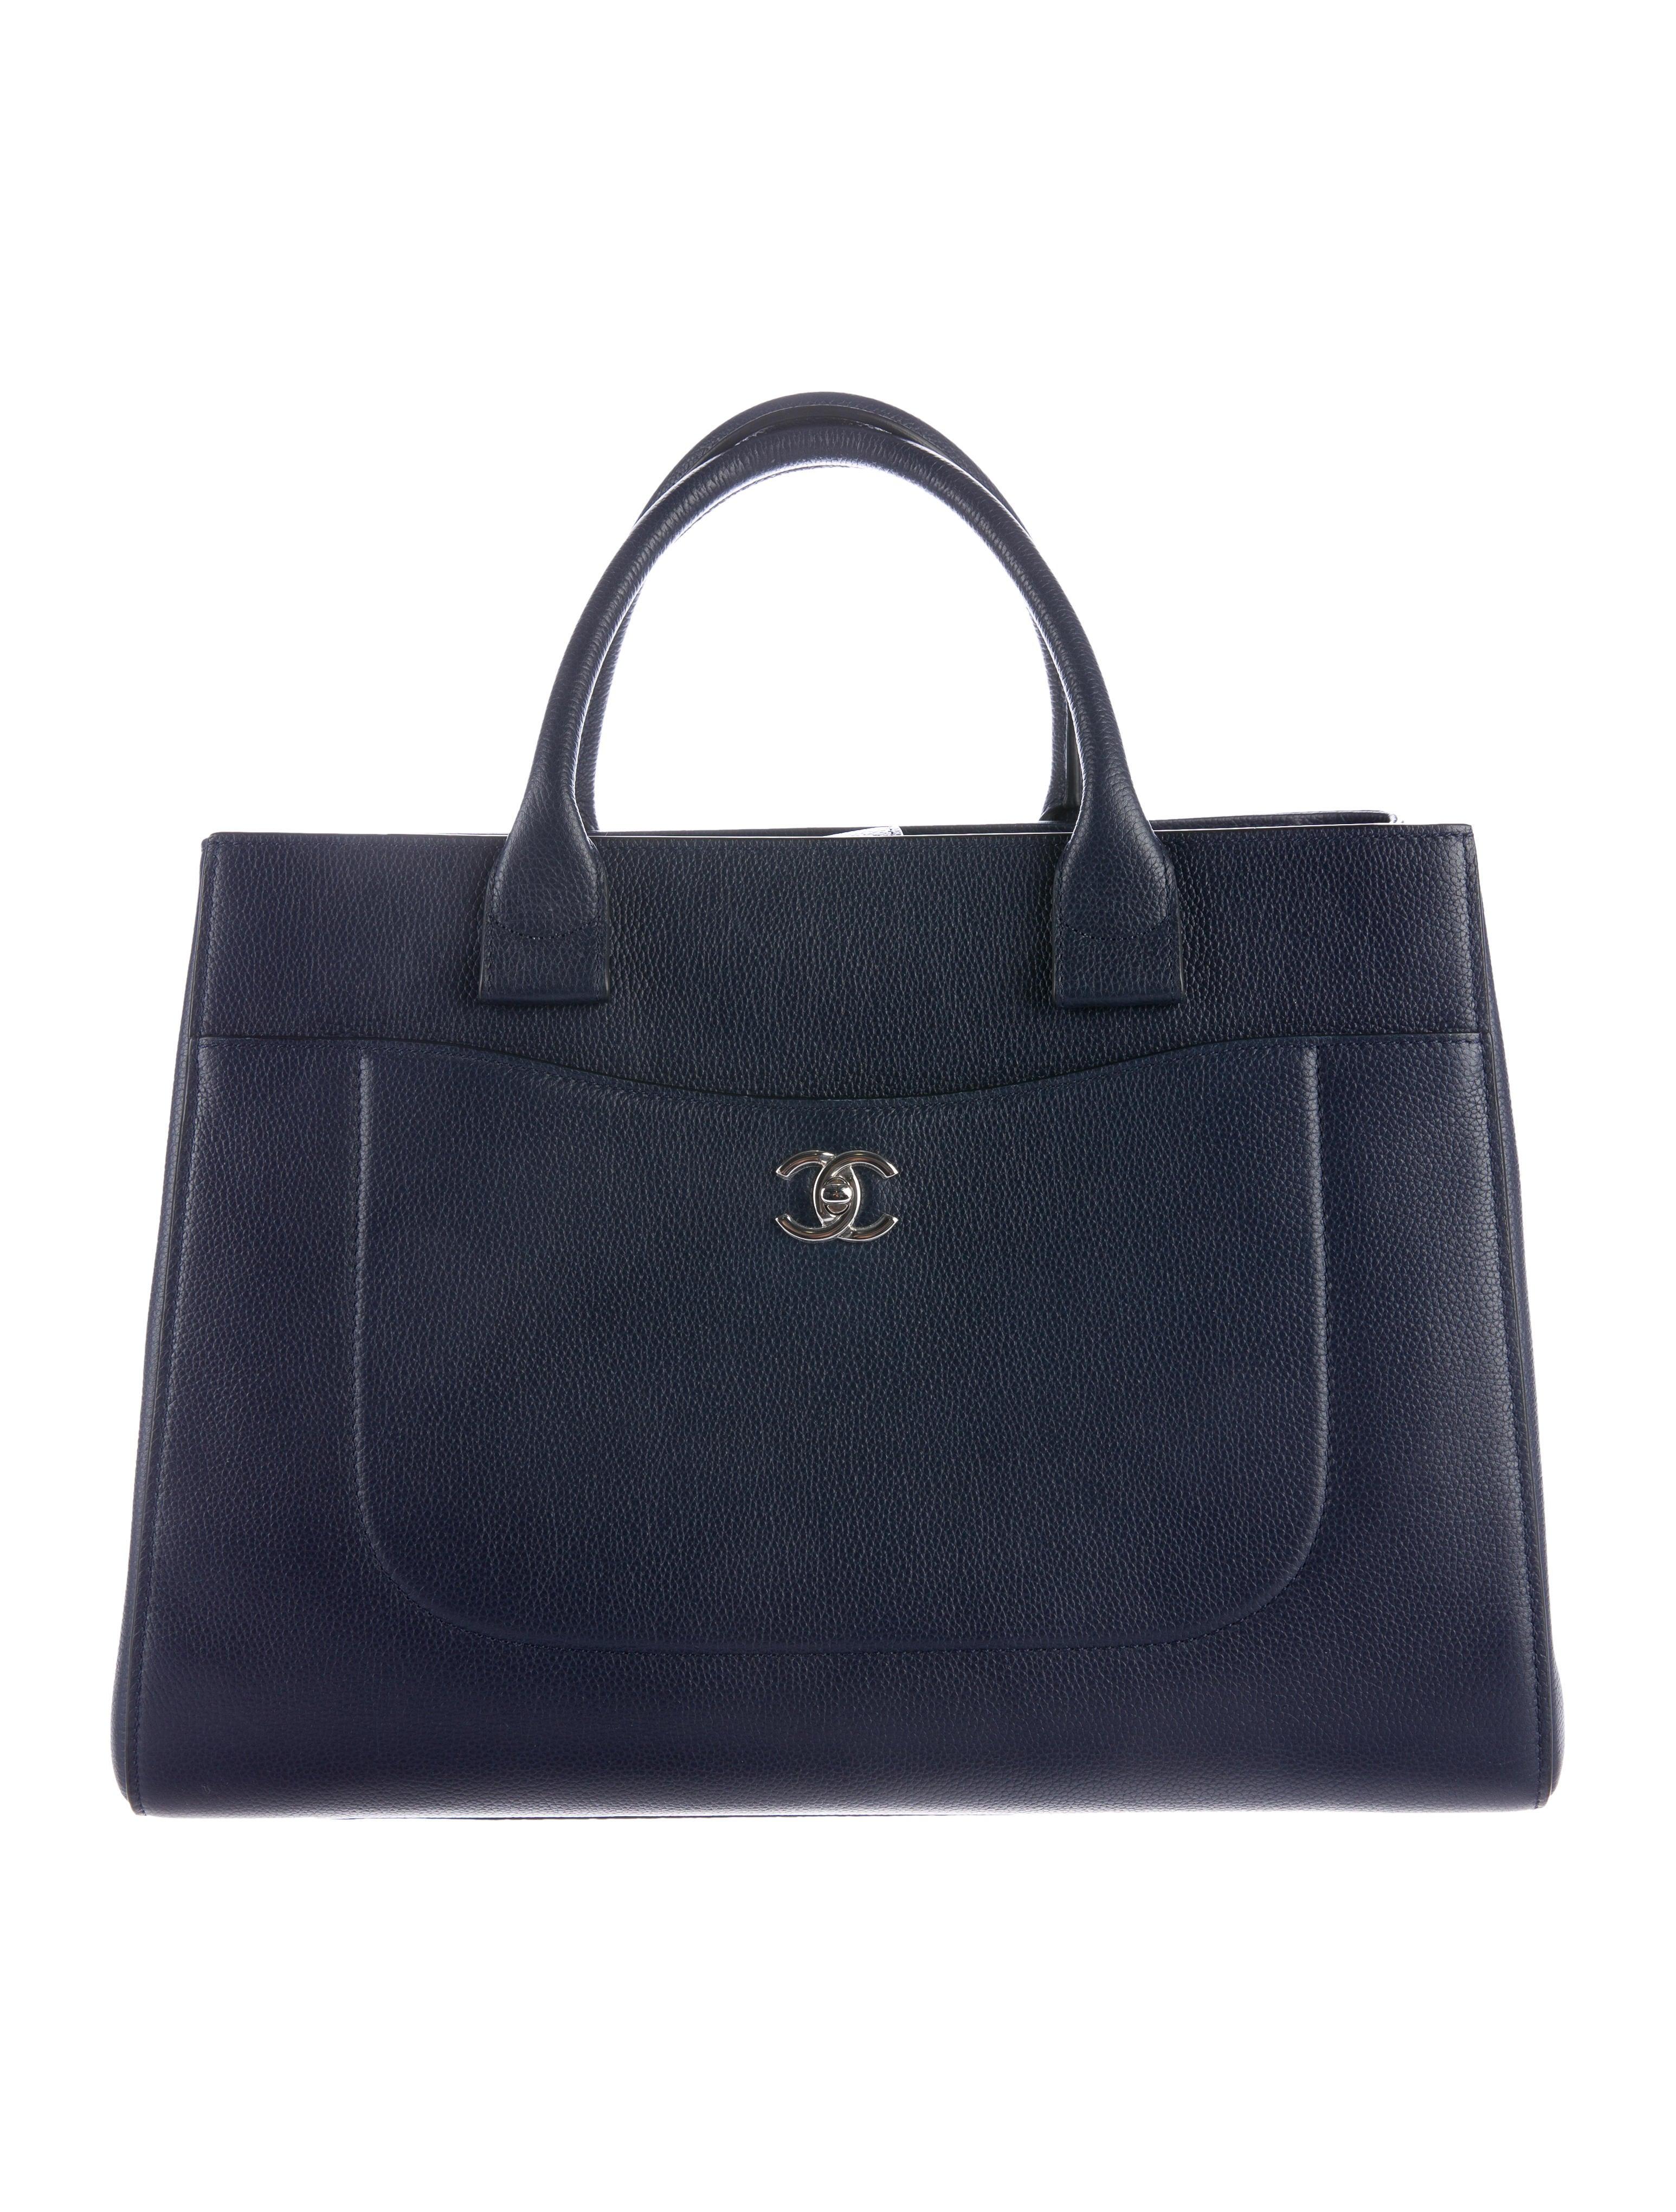 e28dcdc9235e Chanel 2017 Large Neo Executive Shopping Tote - Handbags - CHA185253 ...